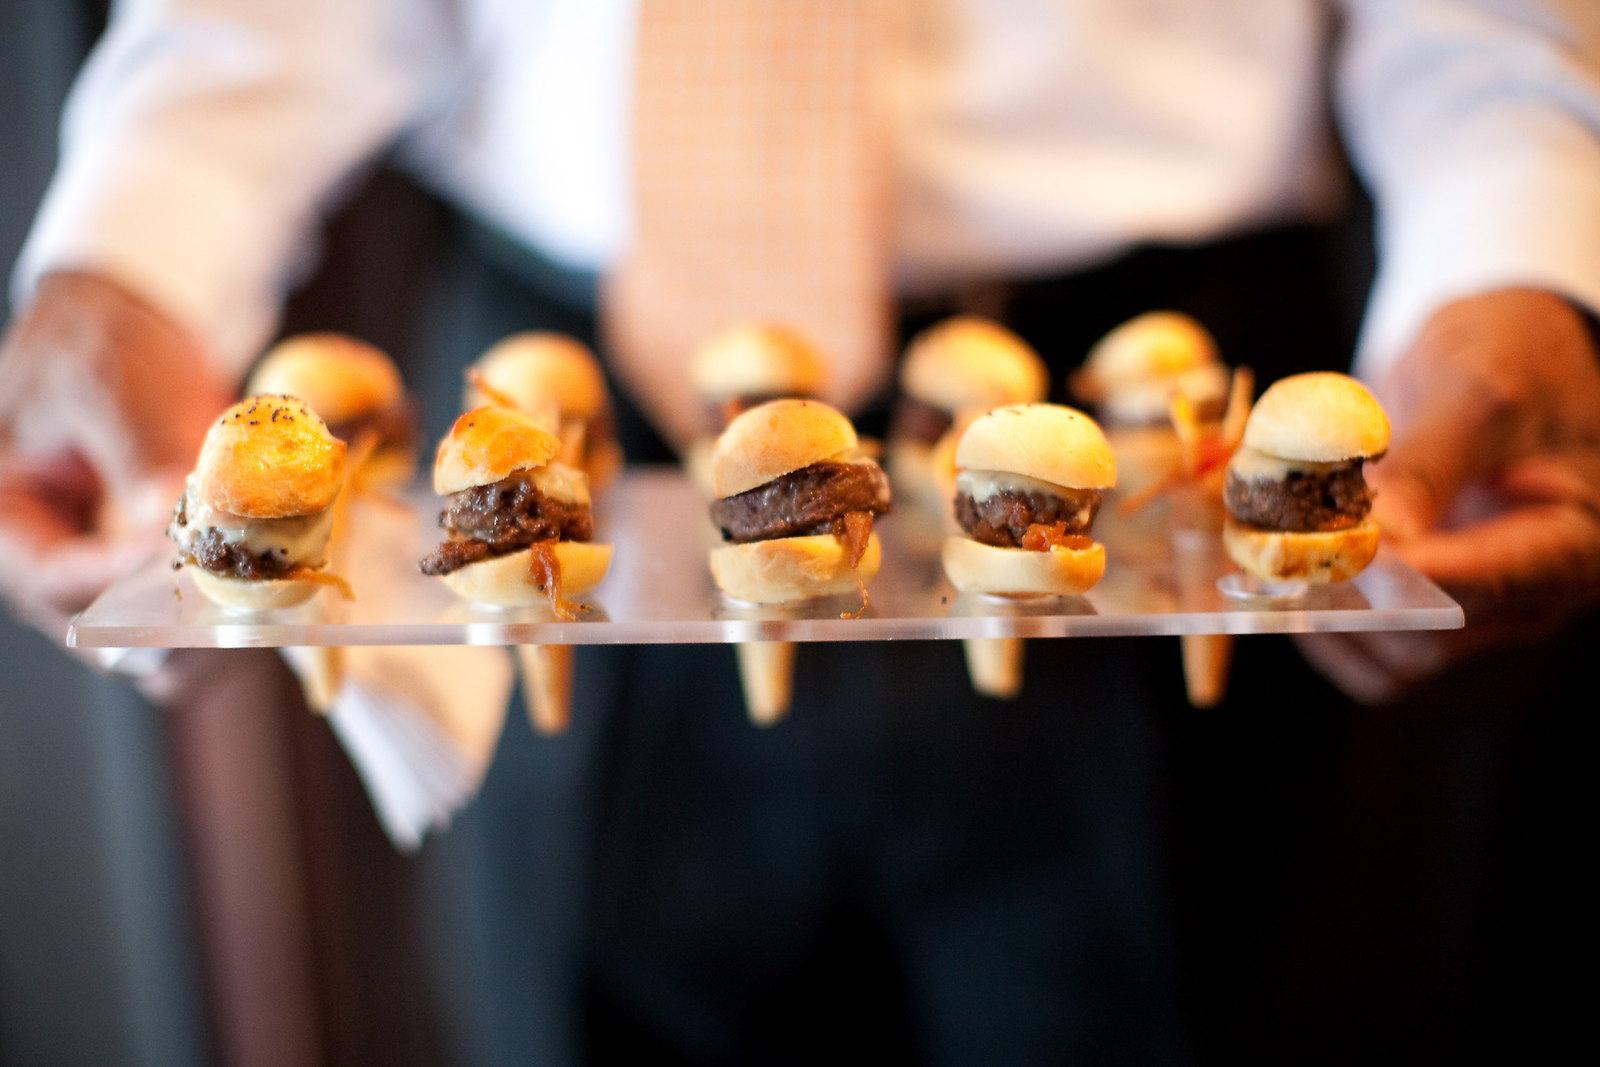 Tiny hamburger sliders.